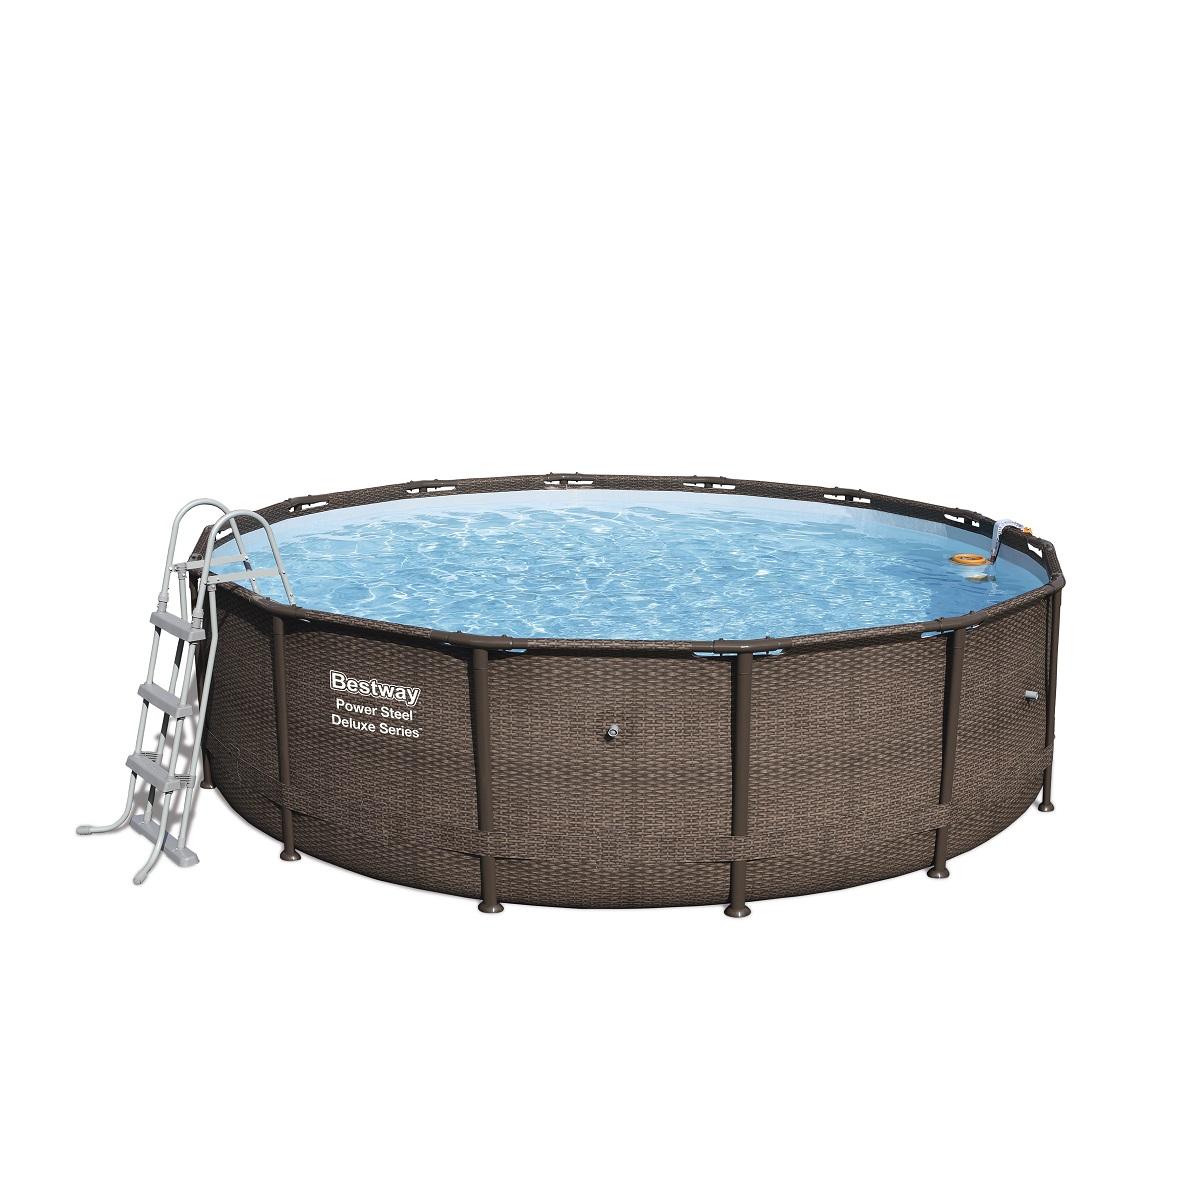 Bazén BESTWAY Power Steel Deluxe 427 x 107 cm set s filtrací - hnědý